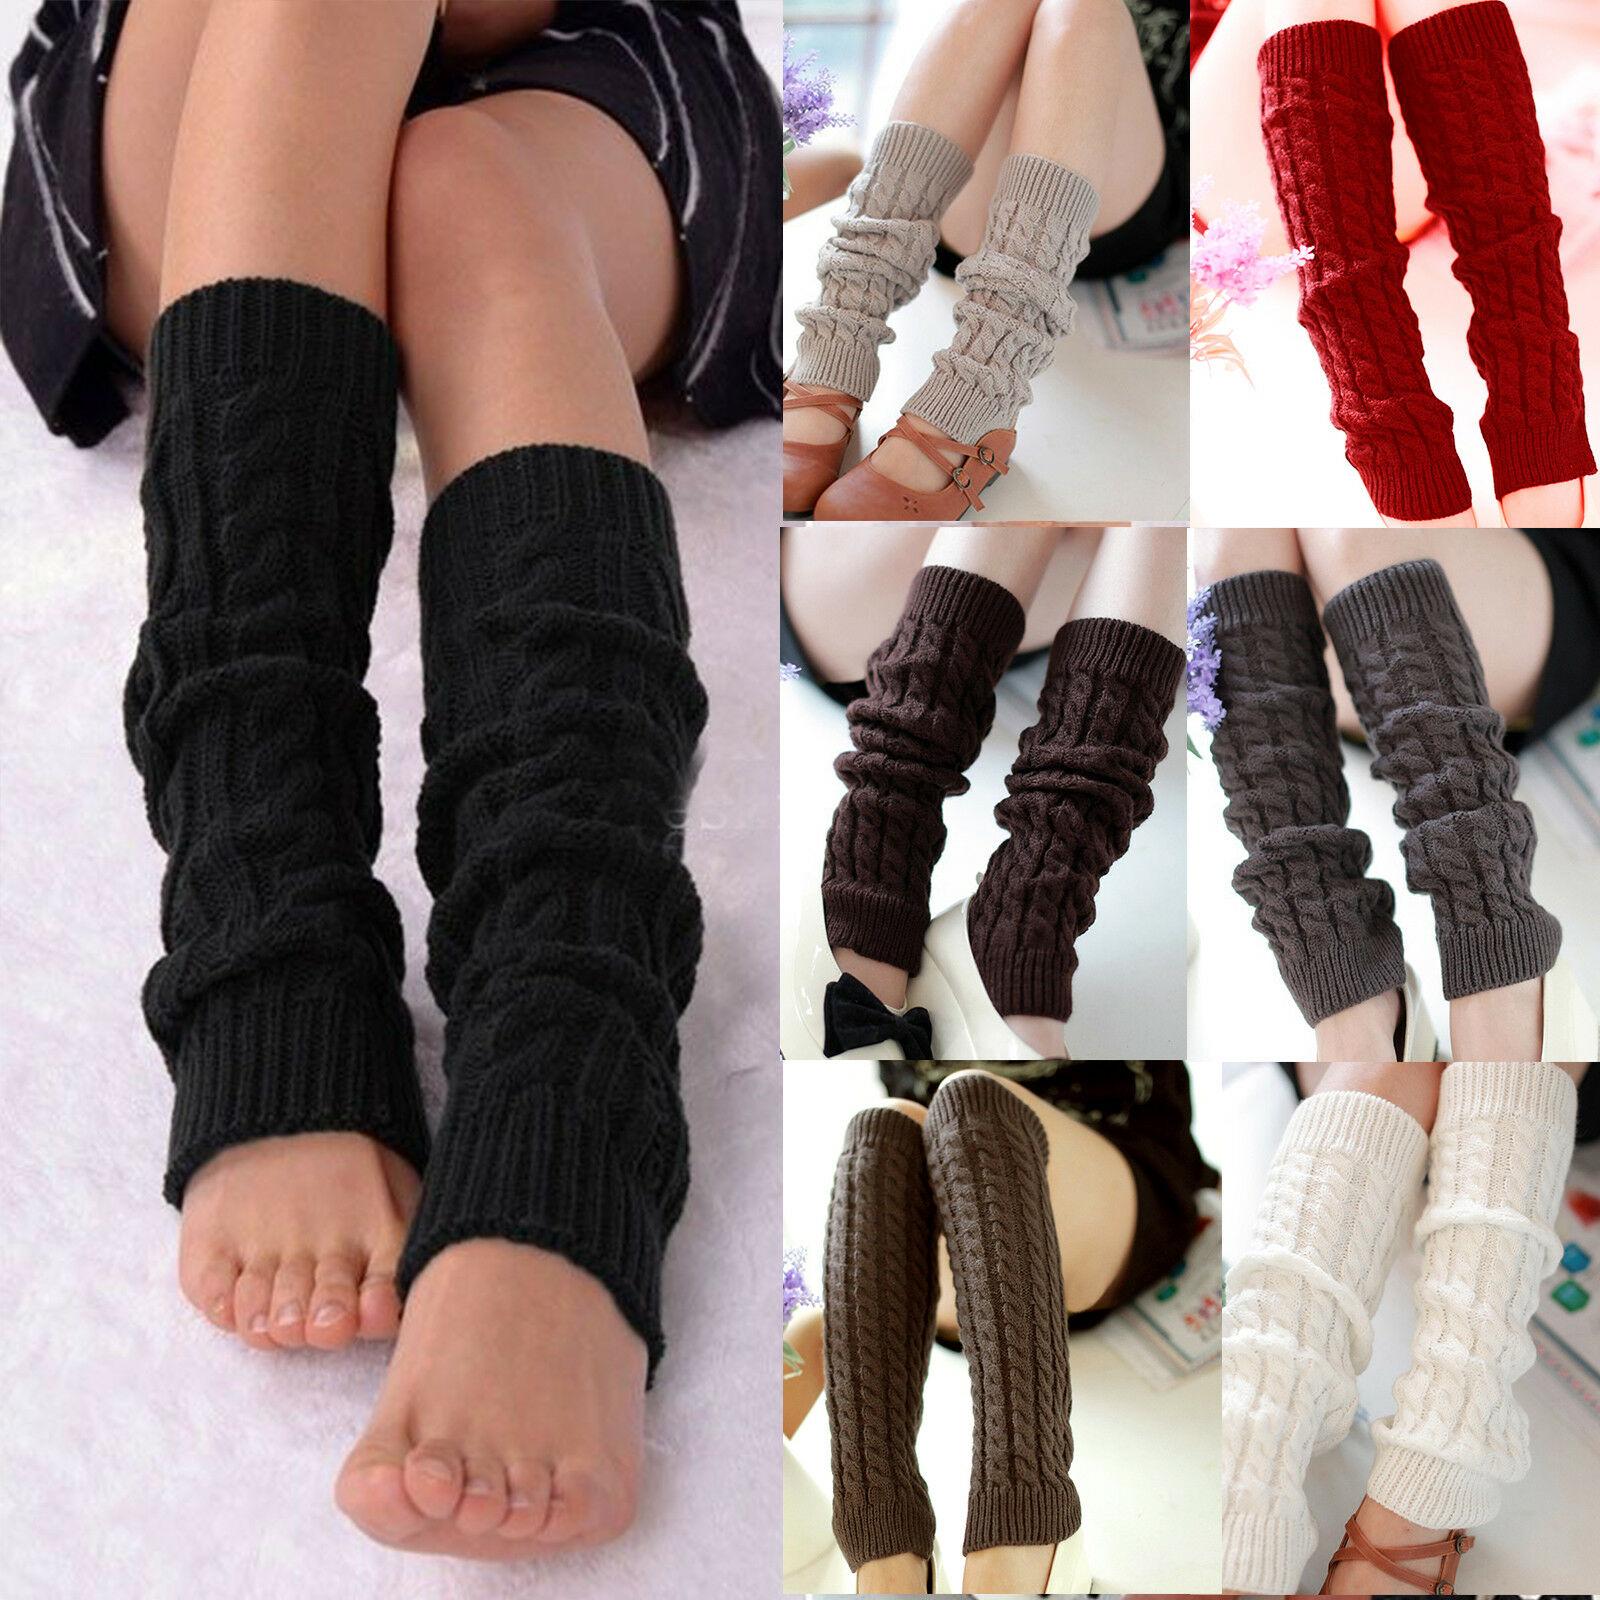 1 Pair Winter Warm Leg Warmer Women Knee High Knitted Solid Crochet Leg Warmers Socks Boot Cuffs Bee